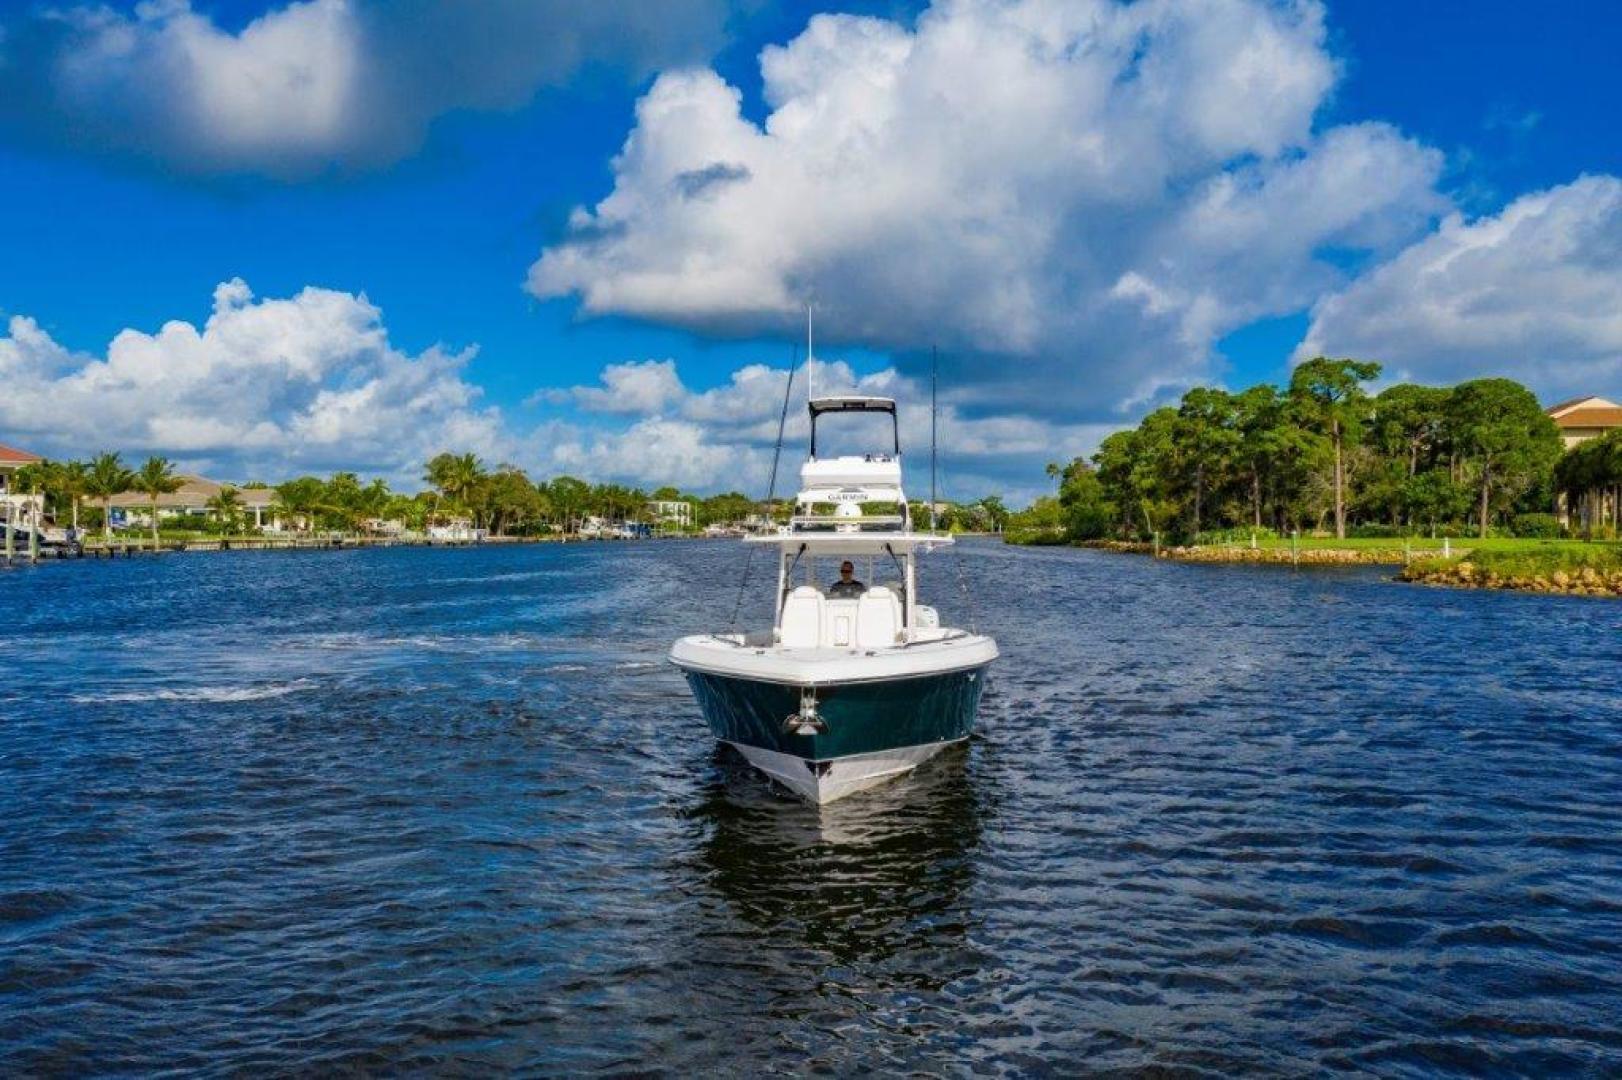 Everglades-435 Center Console 2019-Bahama Papa Palm Beach Gardens-Florida-United States-Bahama Papa-1570526 | Thumbnail